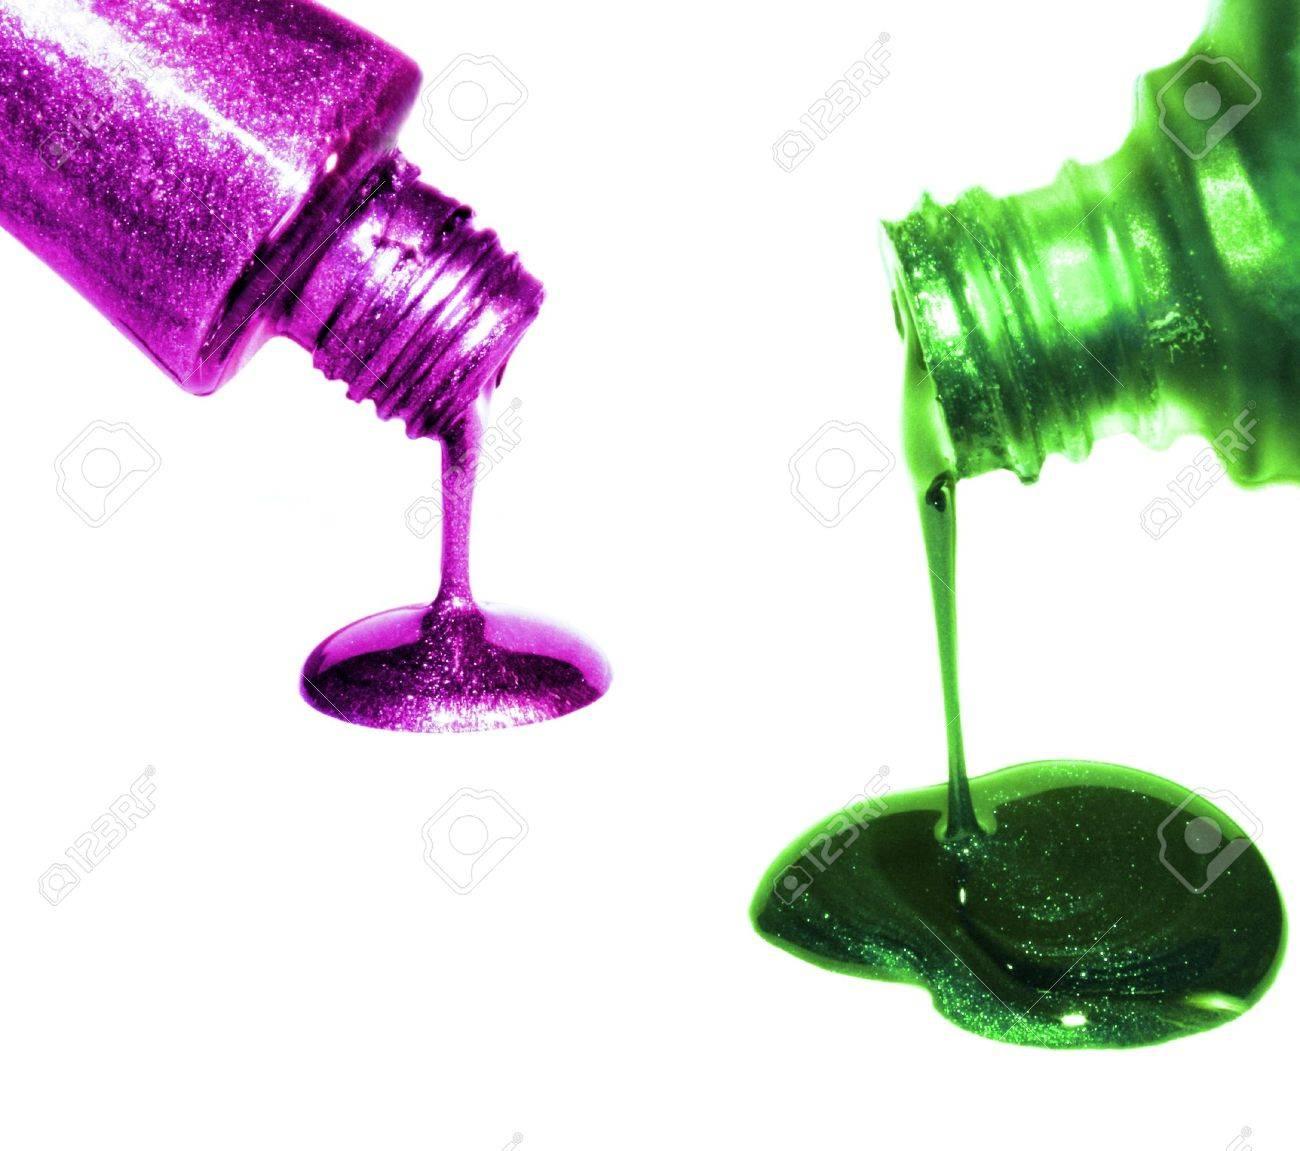 nail polish Stock Photo - 9394204